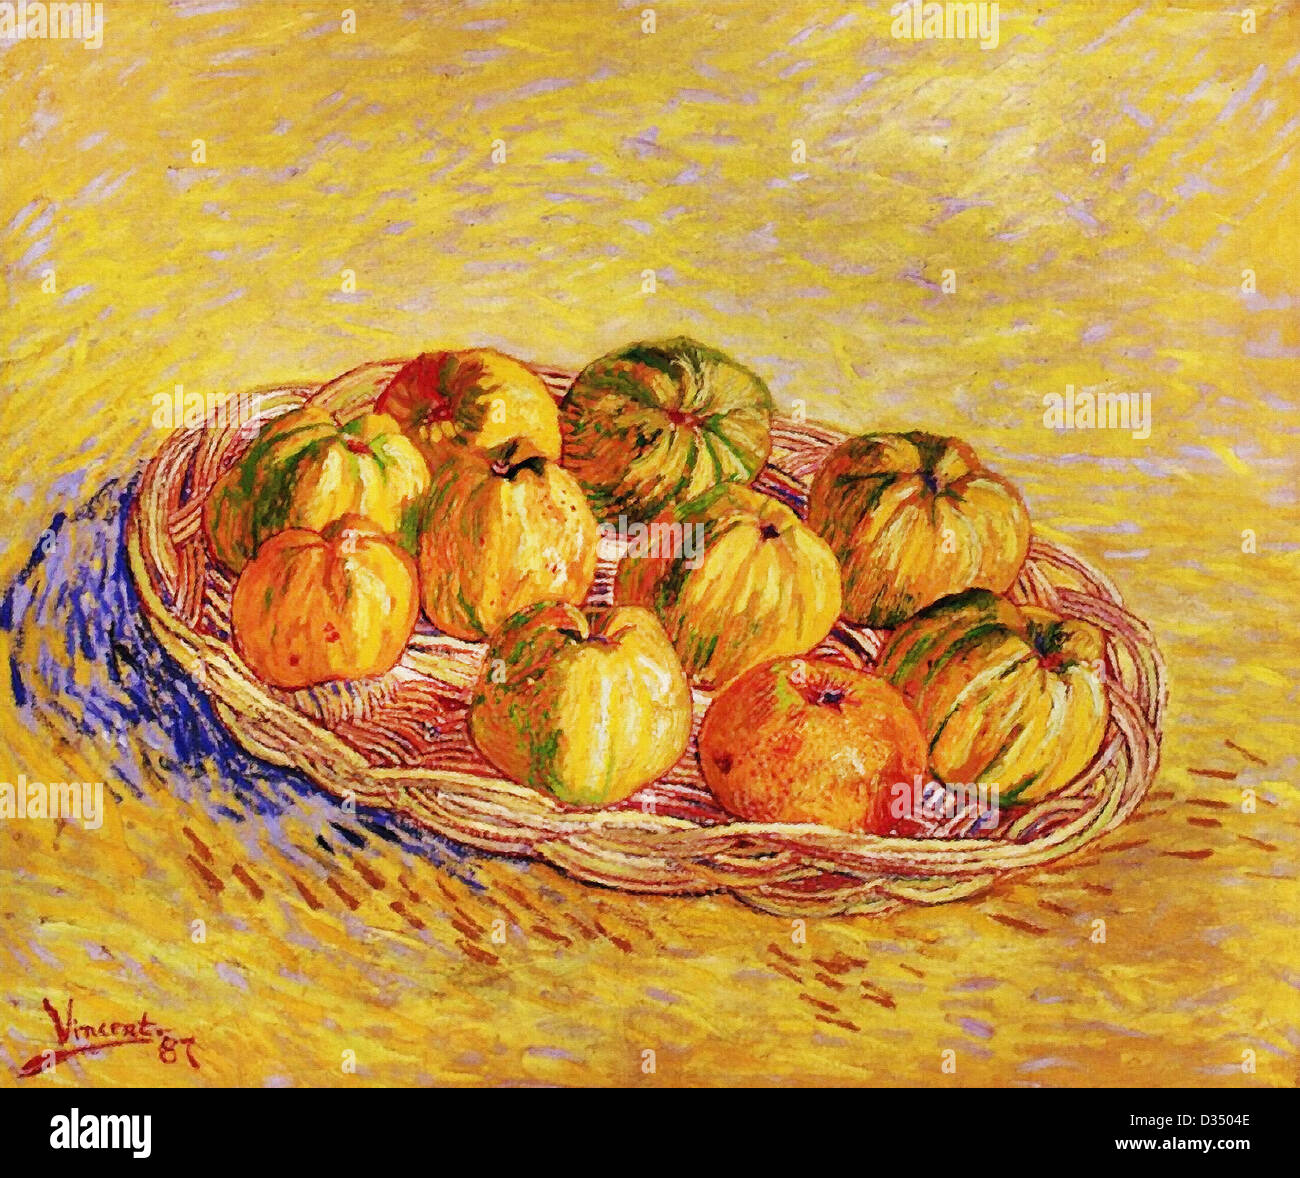 Vincent van Gogh, Bodegón con cesta de manzanas. 1887. Posimpresionismo. Óleo sobre lienzo. Imagen De Stock